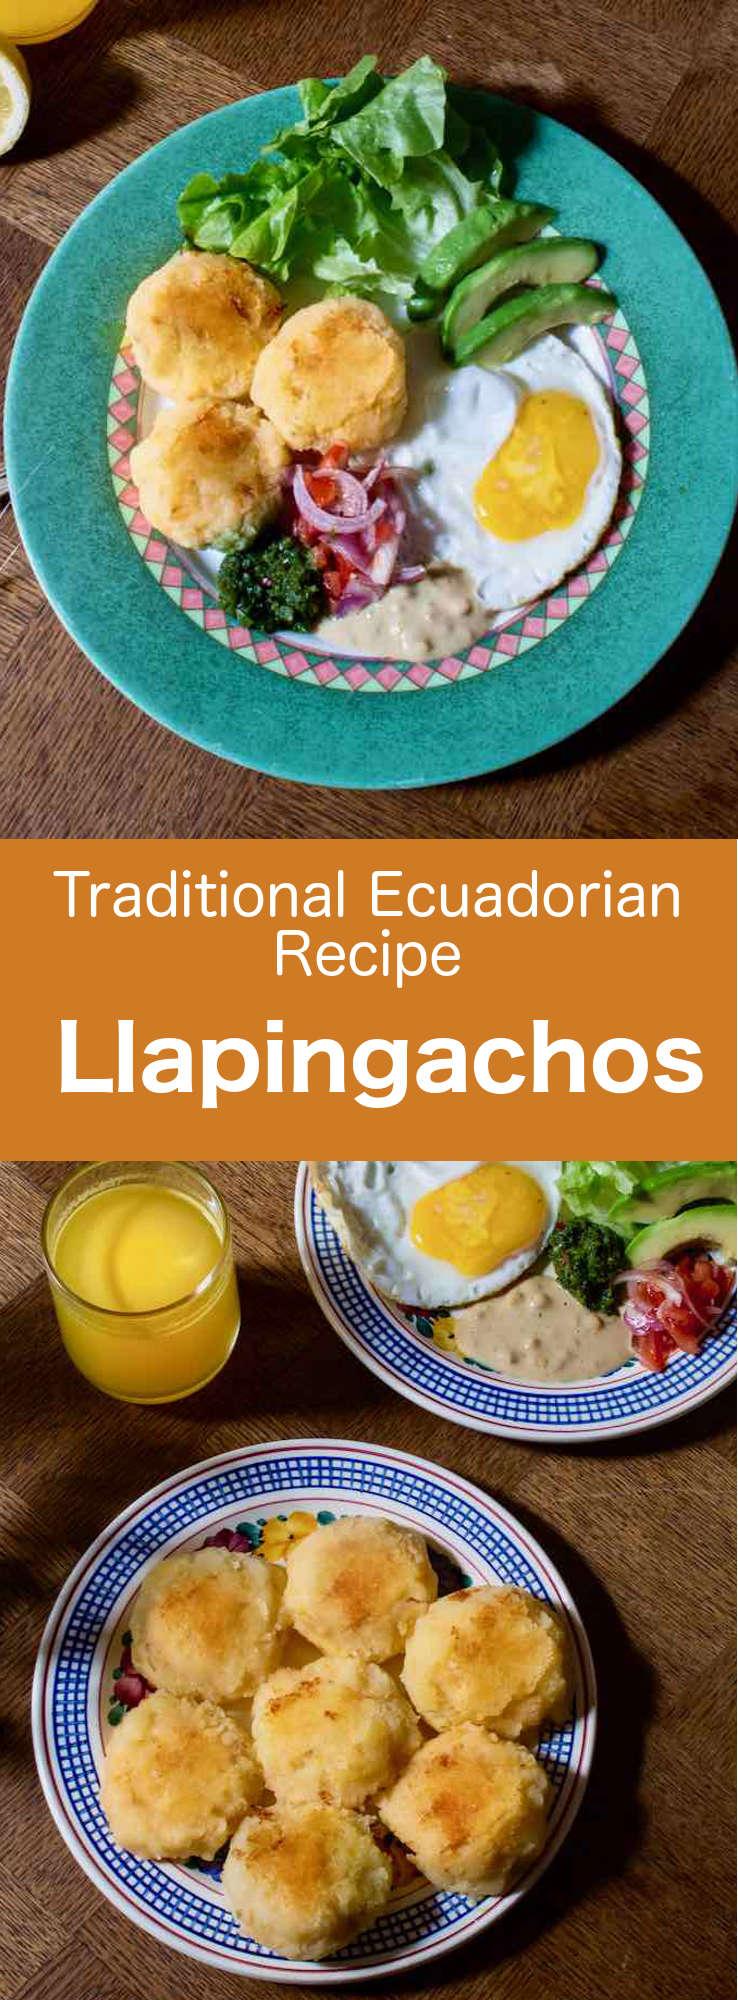 Llapingachos are delicious mashed potato cakes filled with Oaxaca cheese, which are popular in Ecuador and Colombia. #Ecuador #EcuadorFood #EcuadorianCuisine #EcuadorianRecipe #WorldCuisine #196flavors